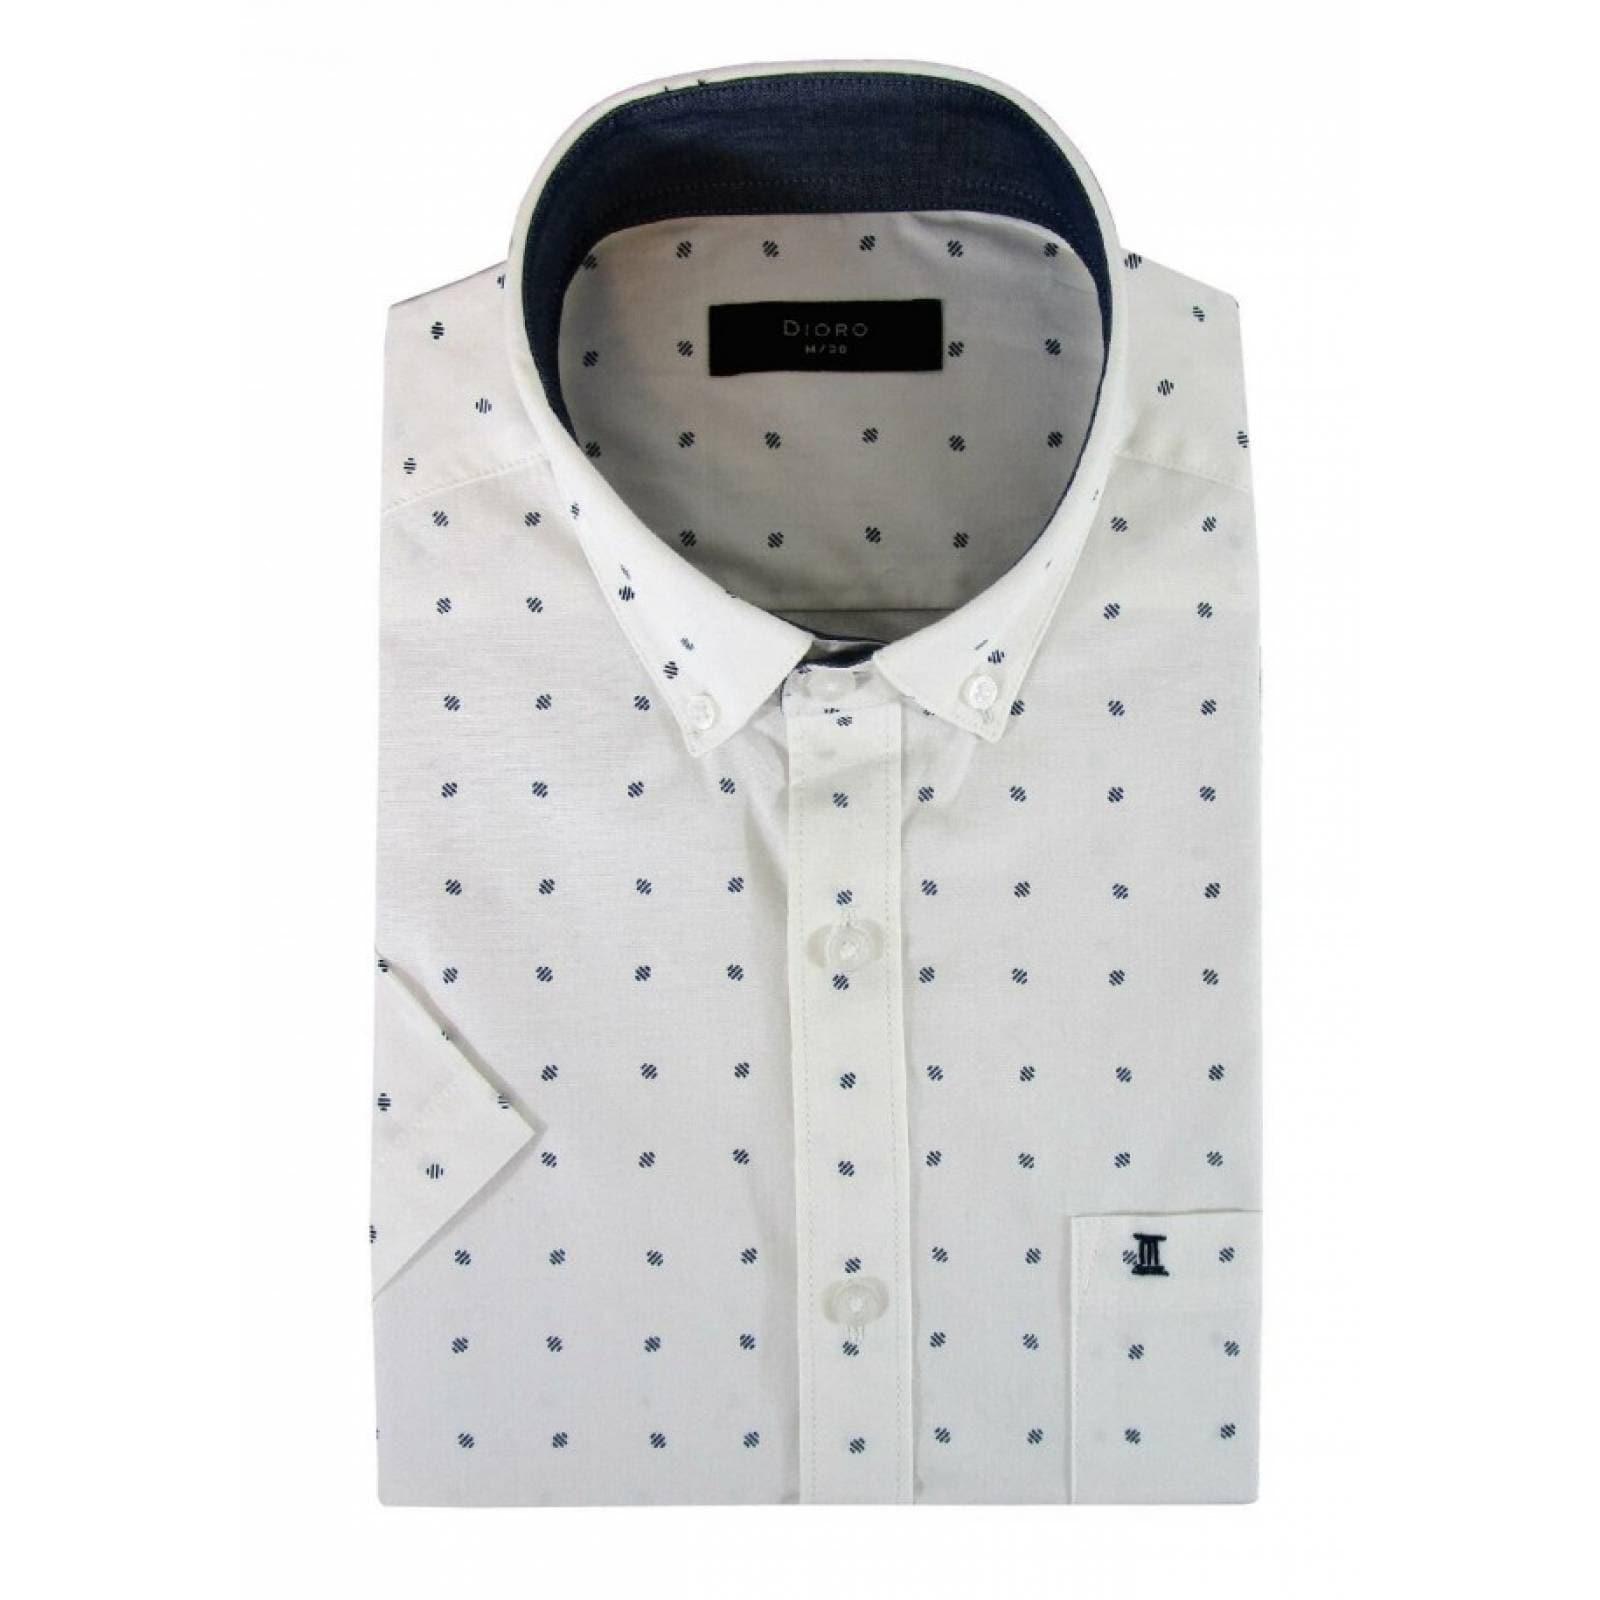 Camisa Dioro;Manga Corta;Estampado Azul ;Mediana